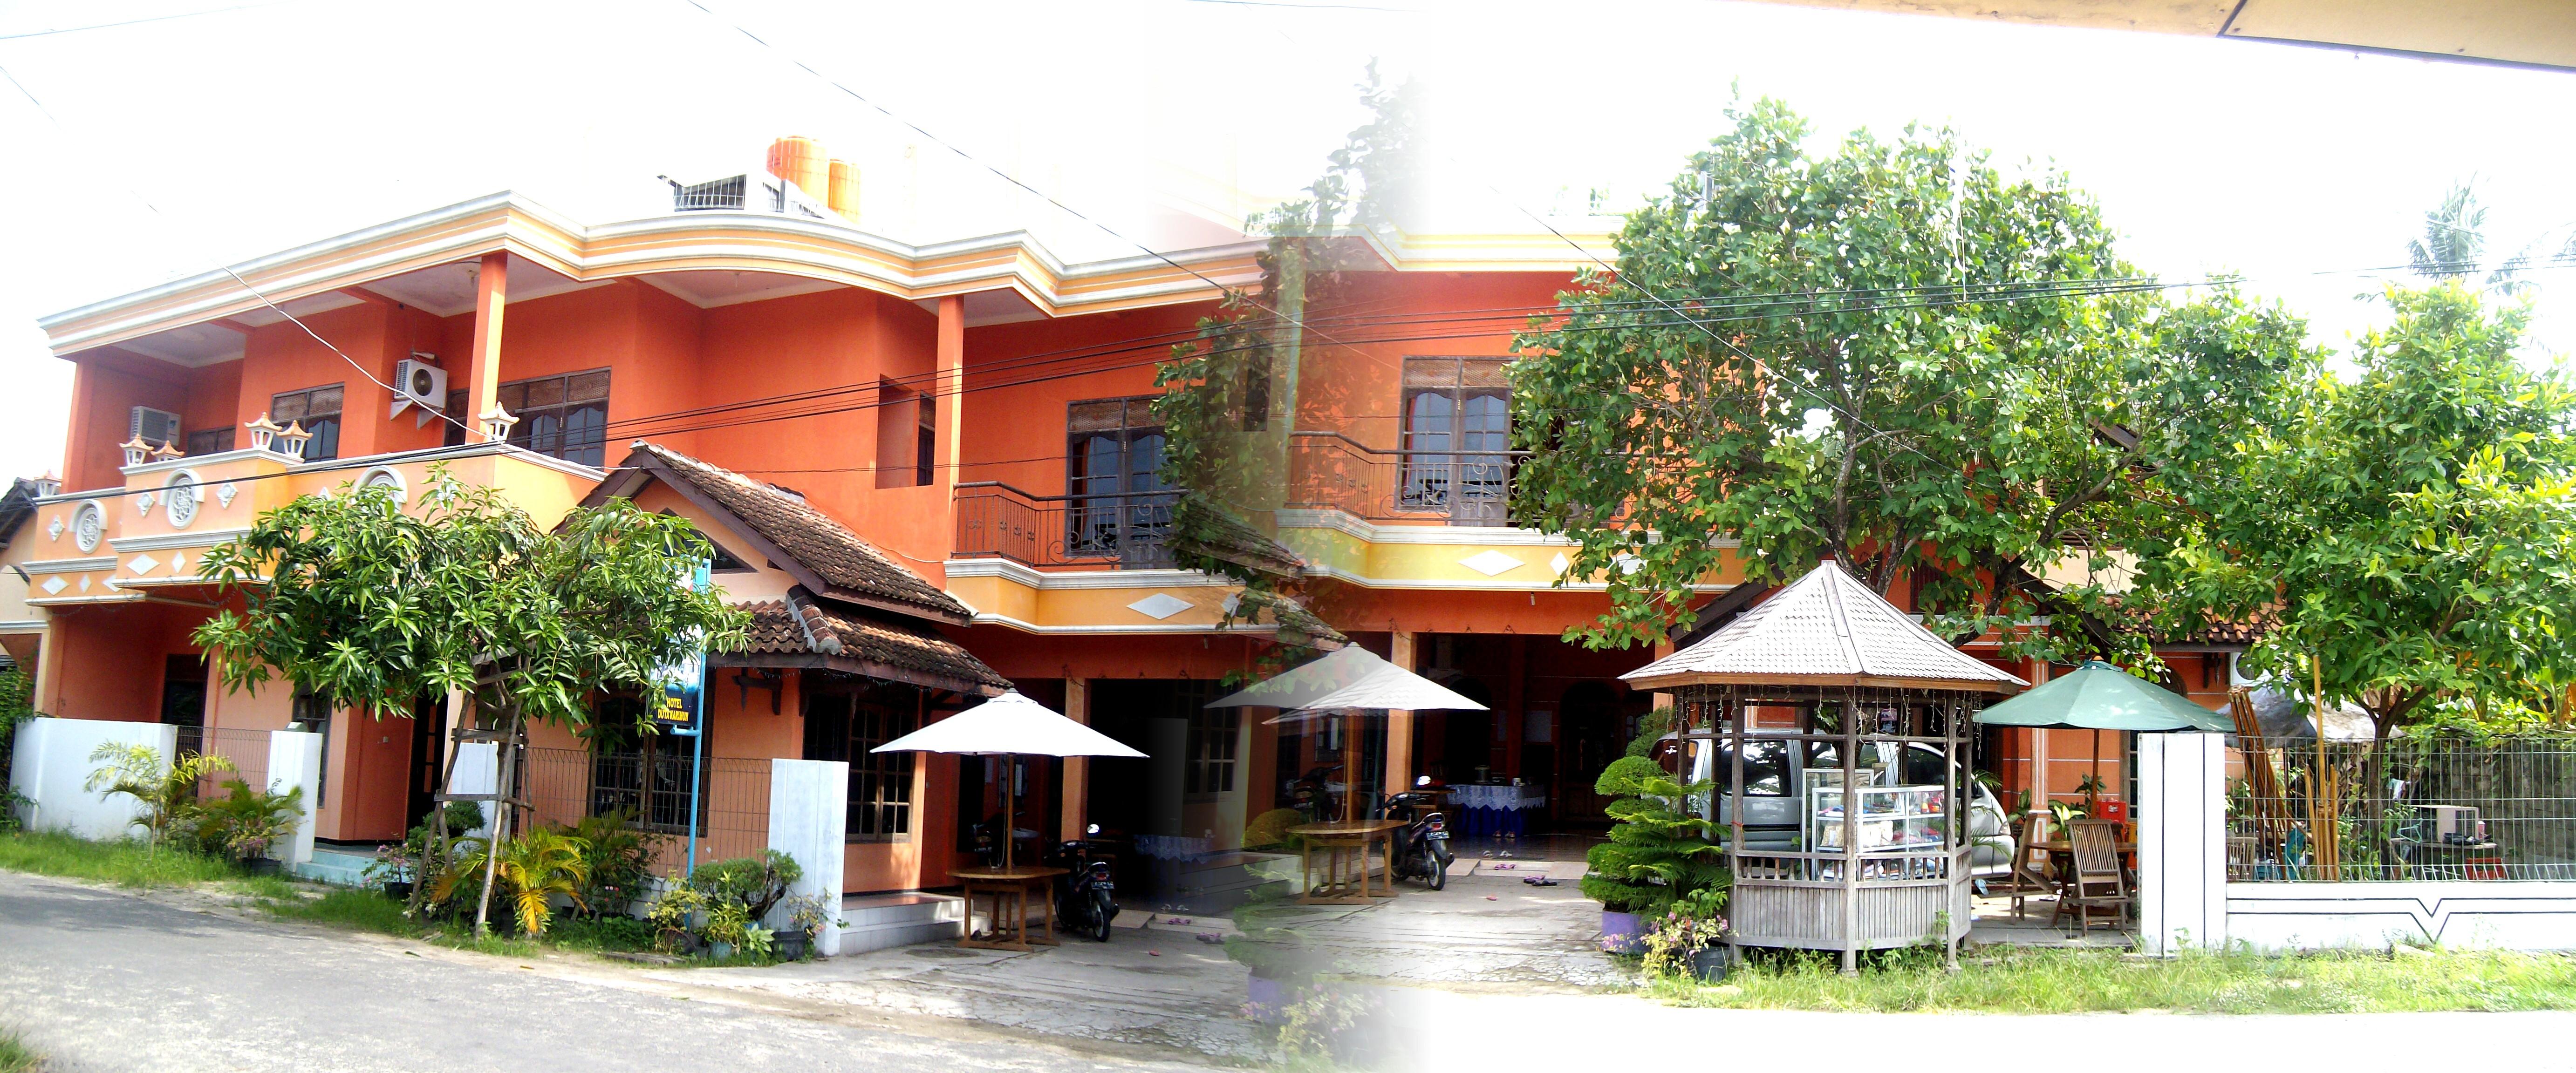 Tarif Per Kamar Hotel Acacia 2013 | Brosur Hotel Murah